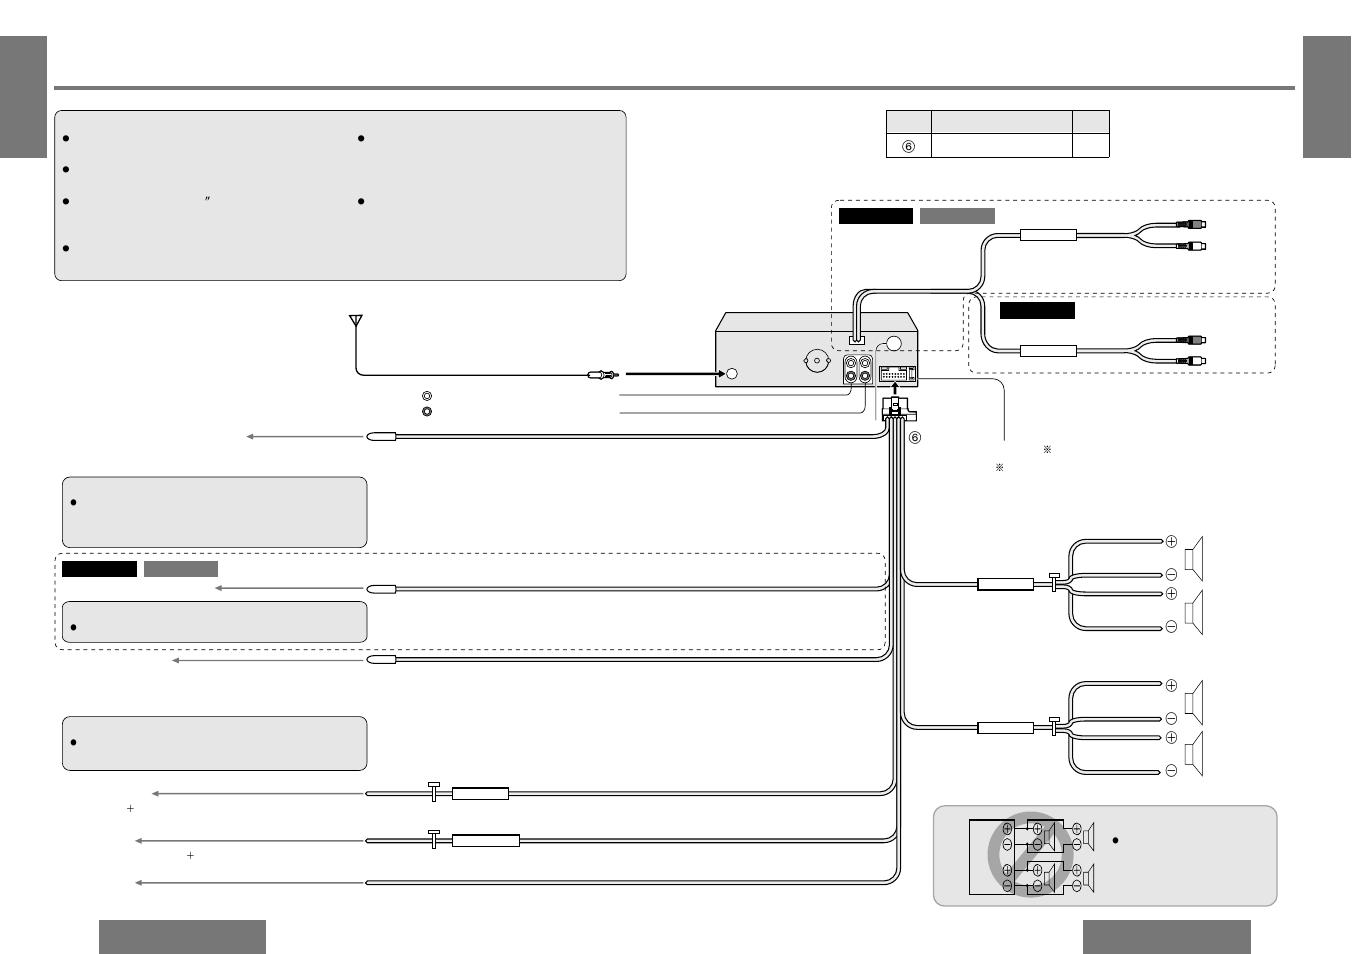 panasonic cq cp137u wiring diagram diy enthusiasts wiring diagrams u2022 rh okdrywall co